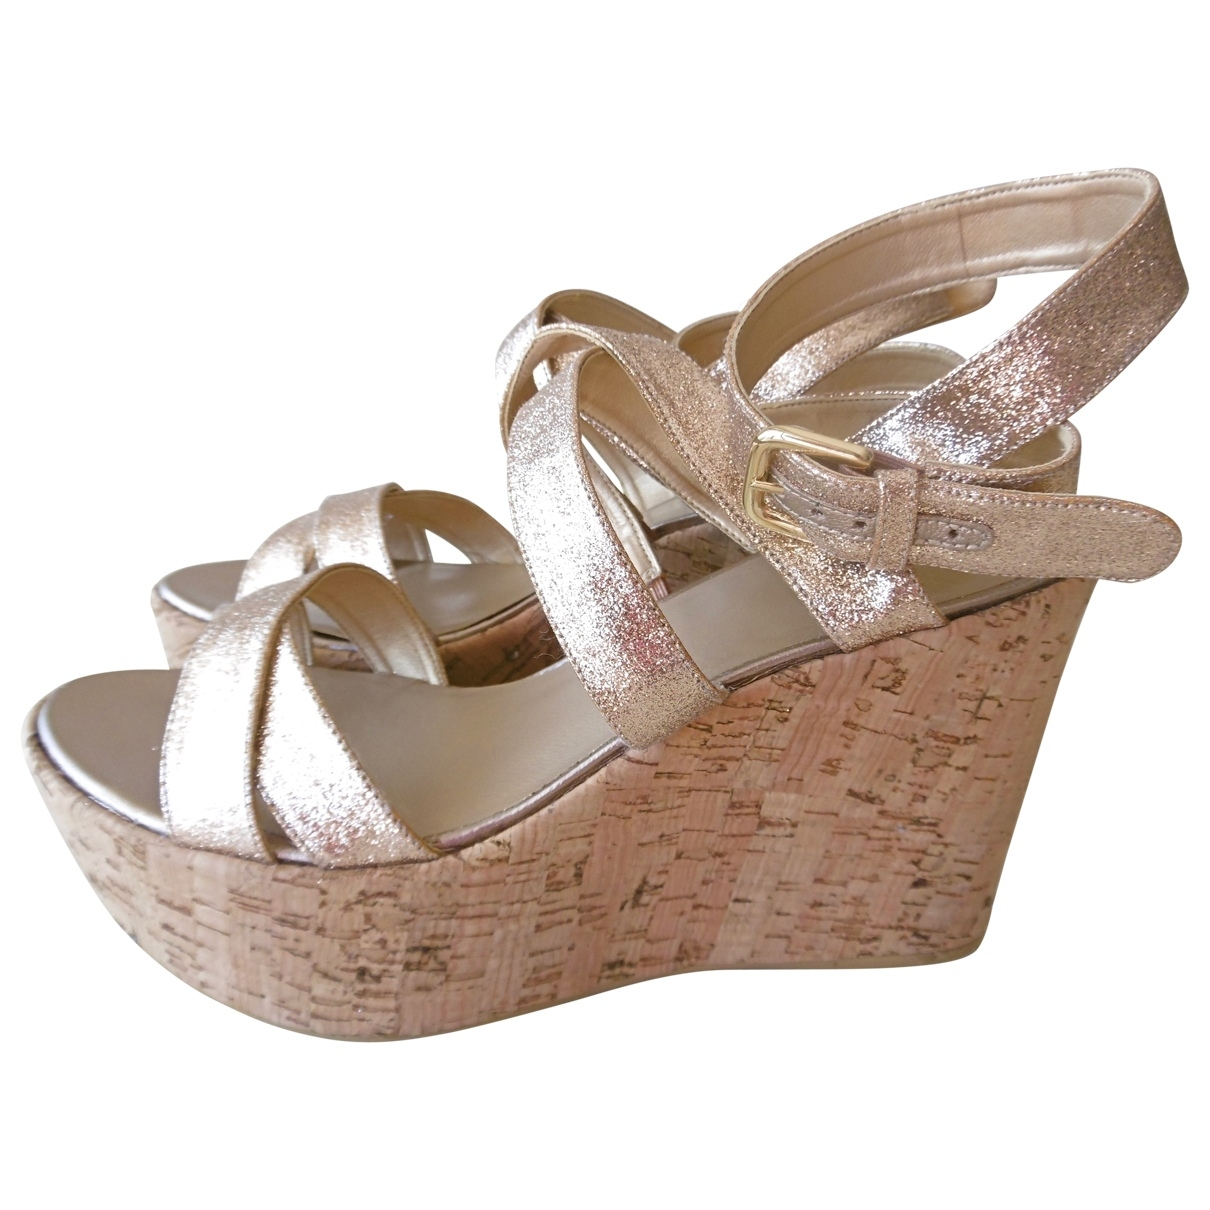 Stuart Weitzman \N Gold Glitter Sandals for Women 37 EU